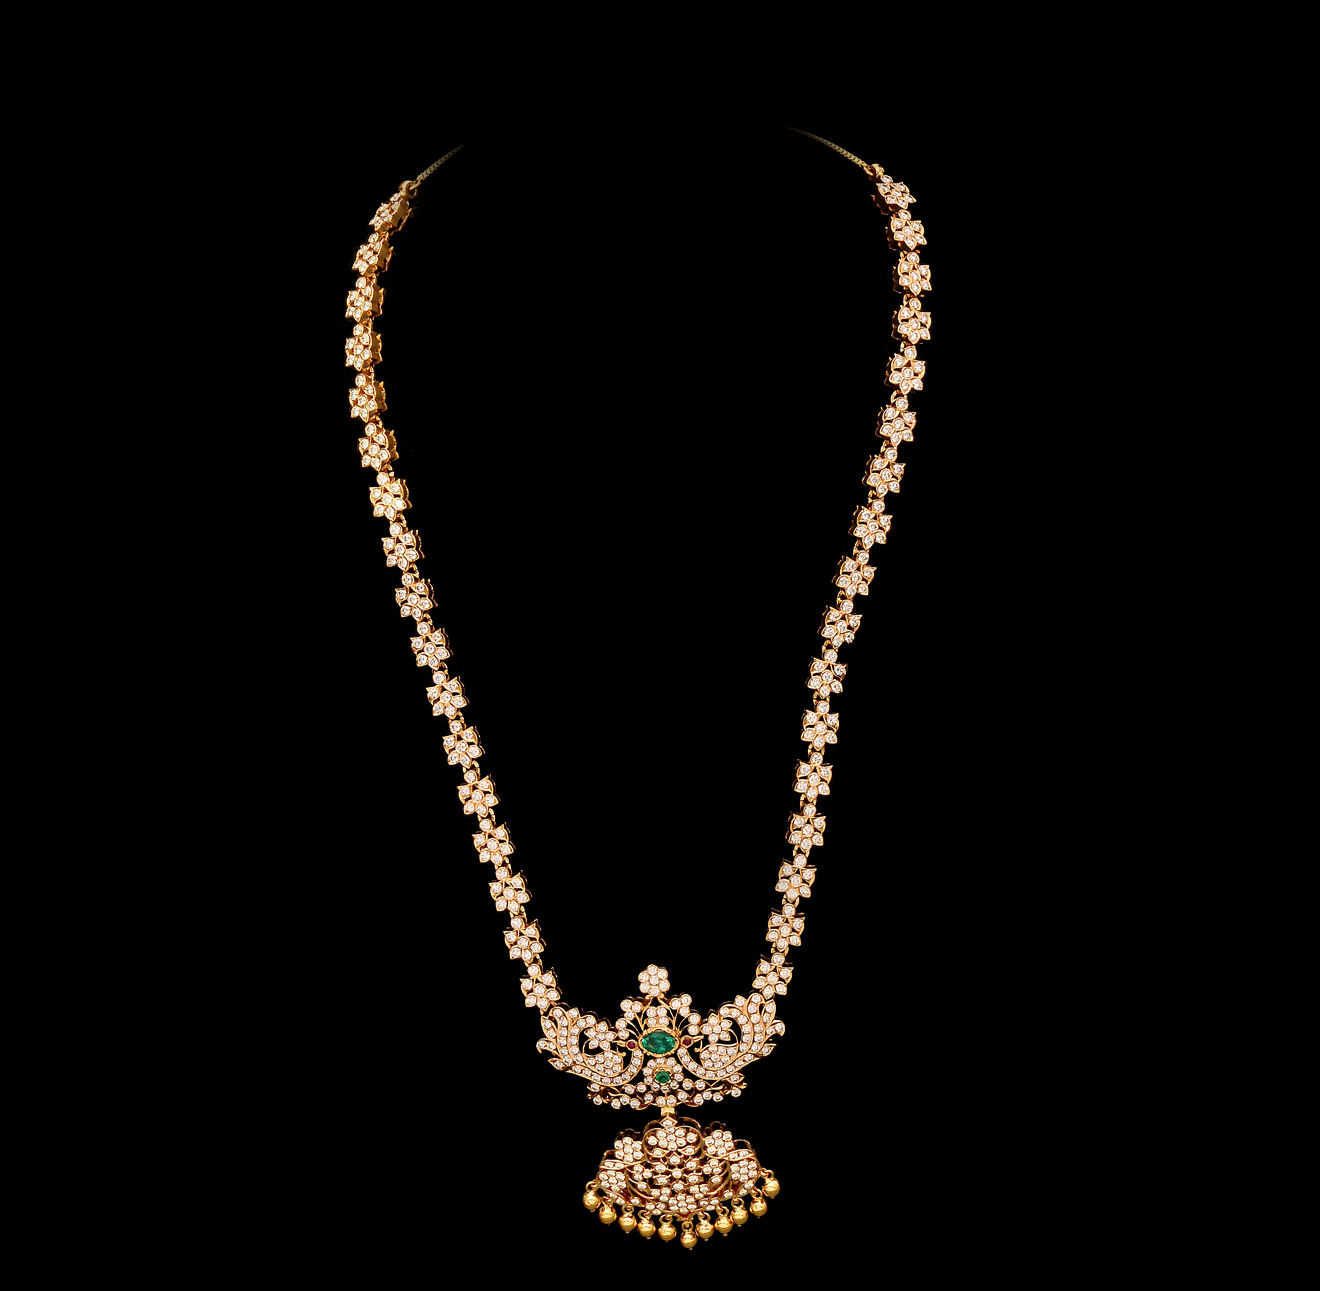 Gold And Diamond Jewellery Designs Indian Diamond Bridal Necklace